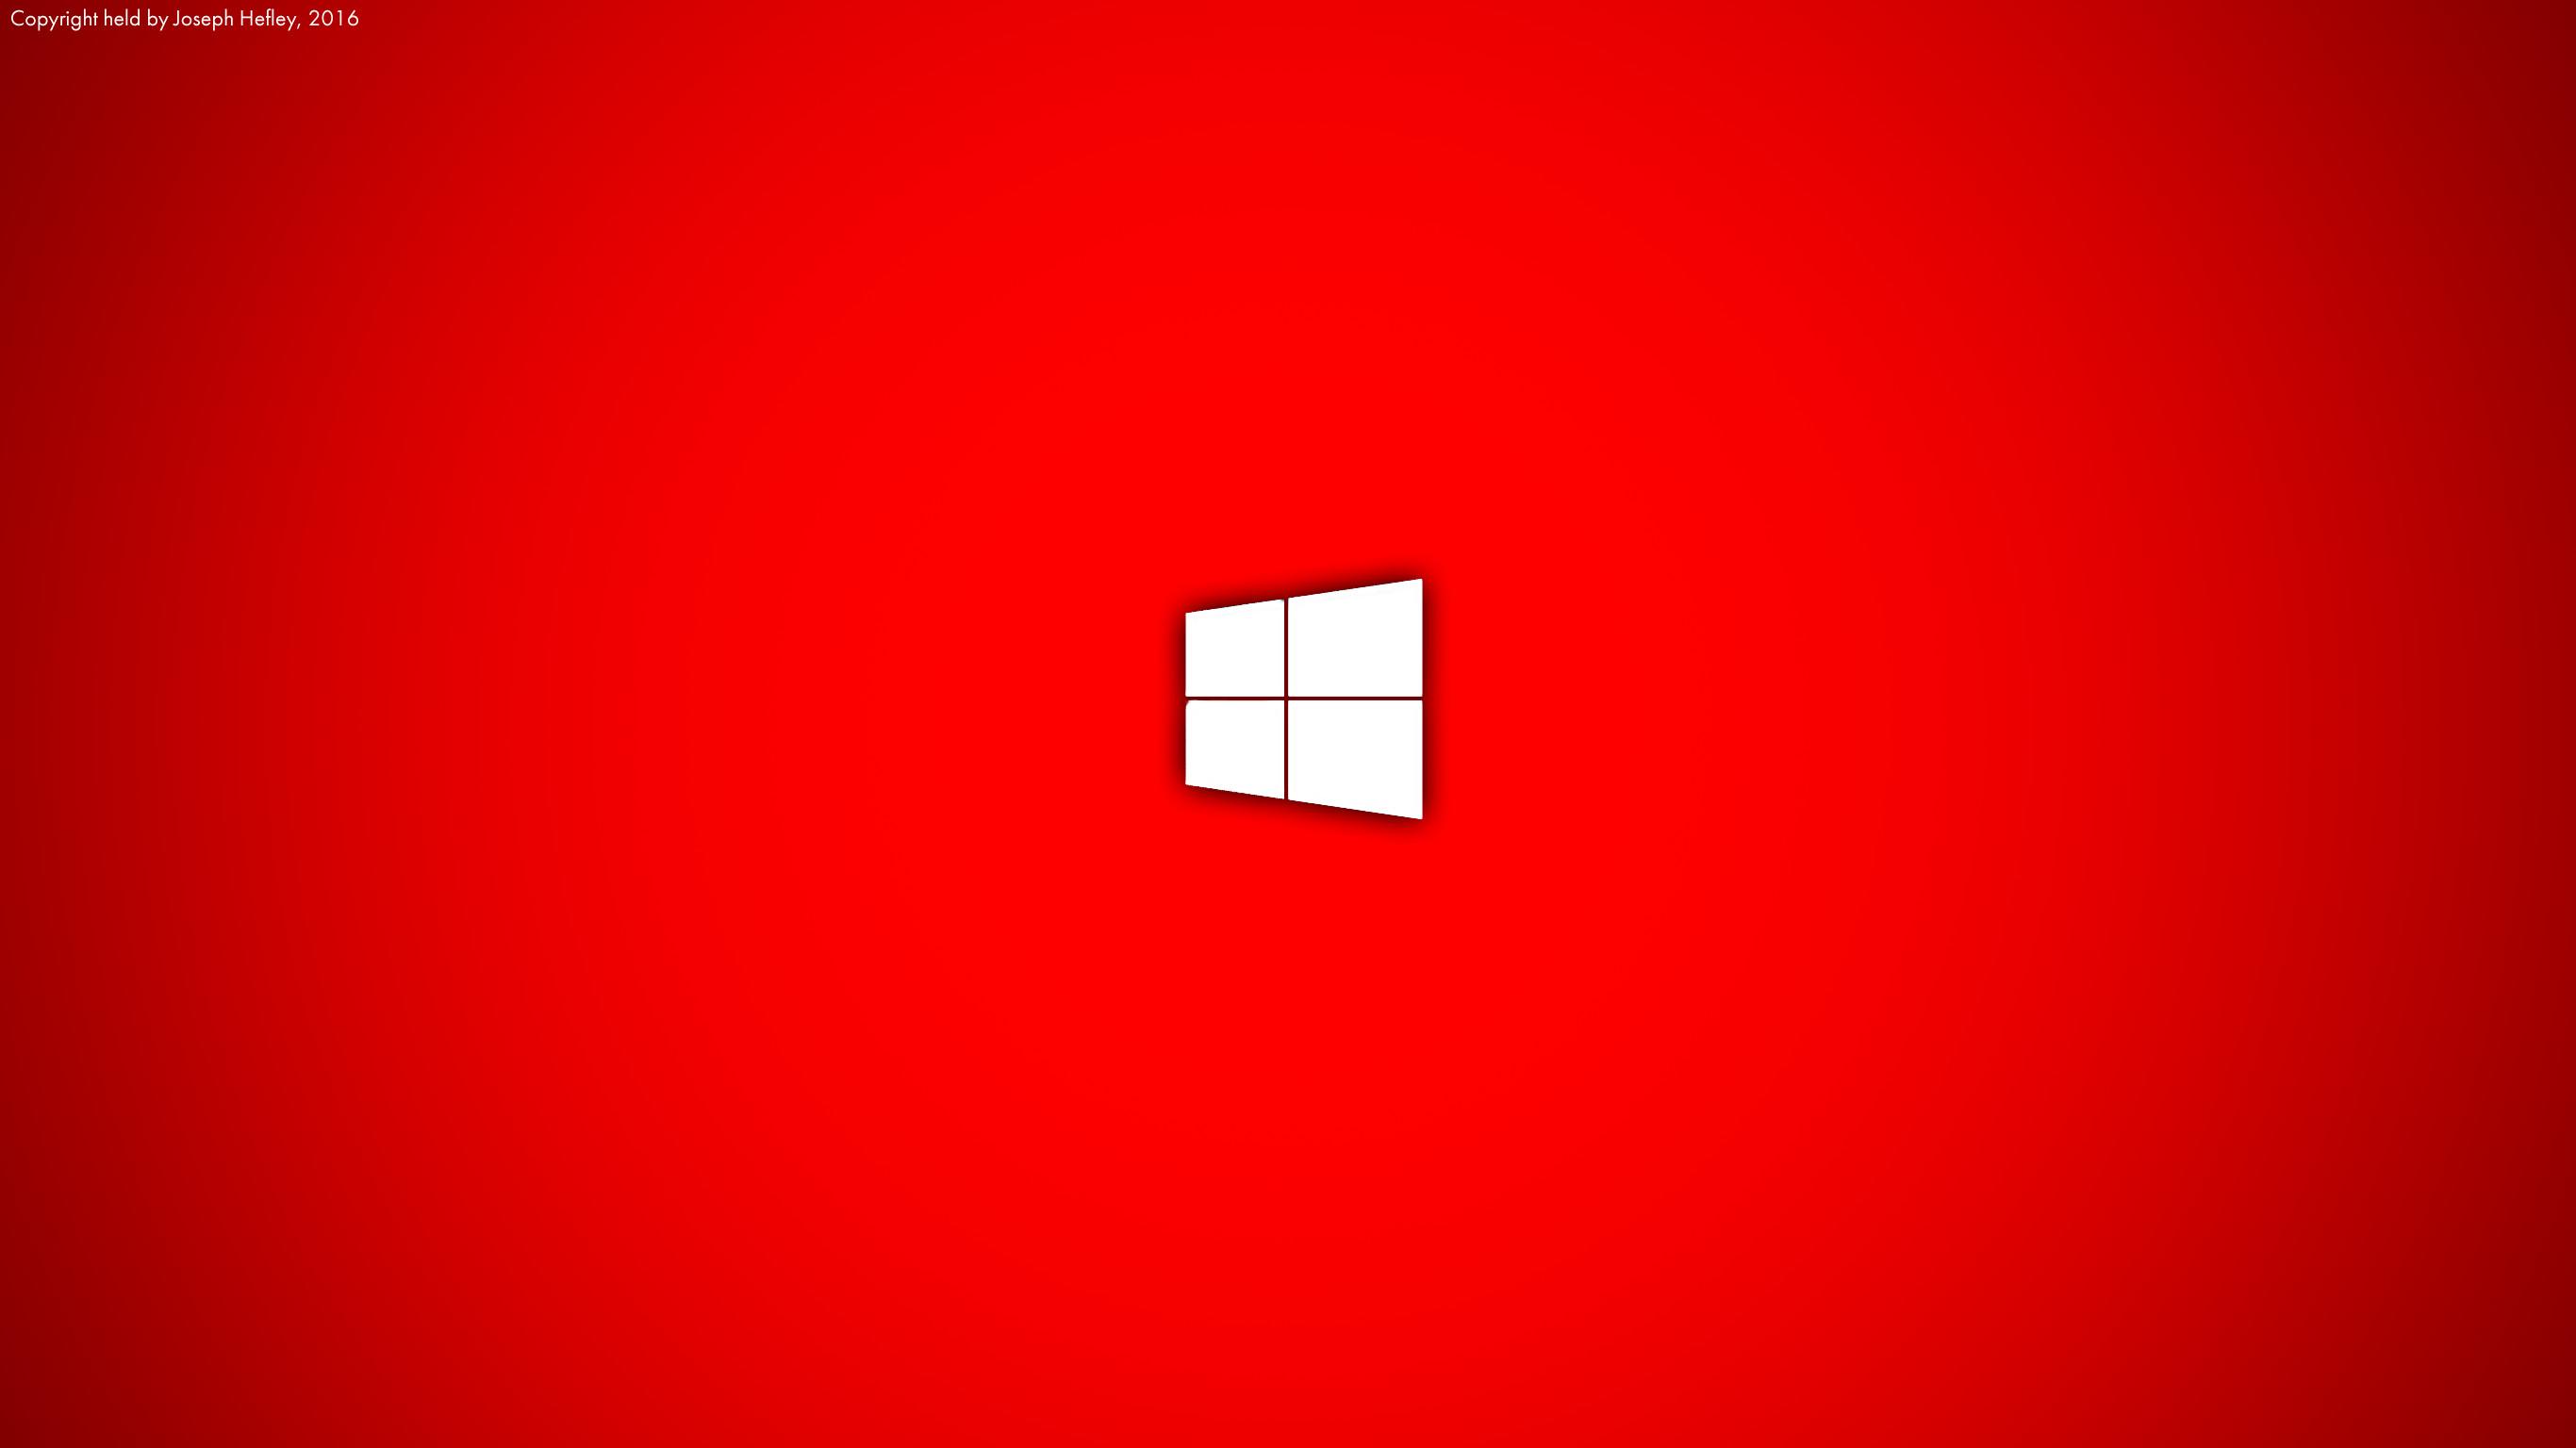 Live Red Windows 10 Wallpaper